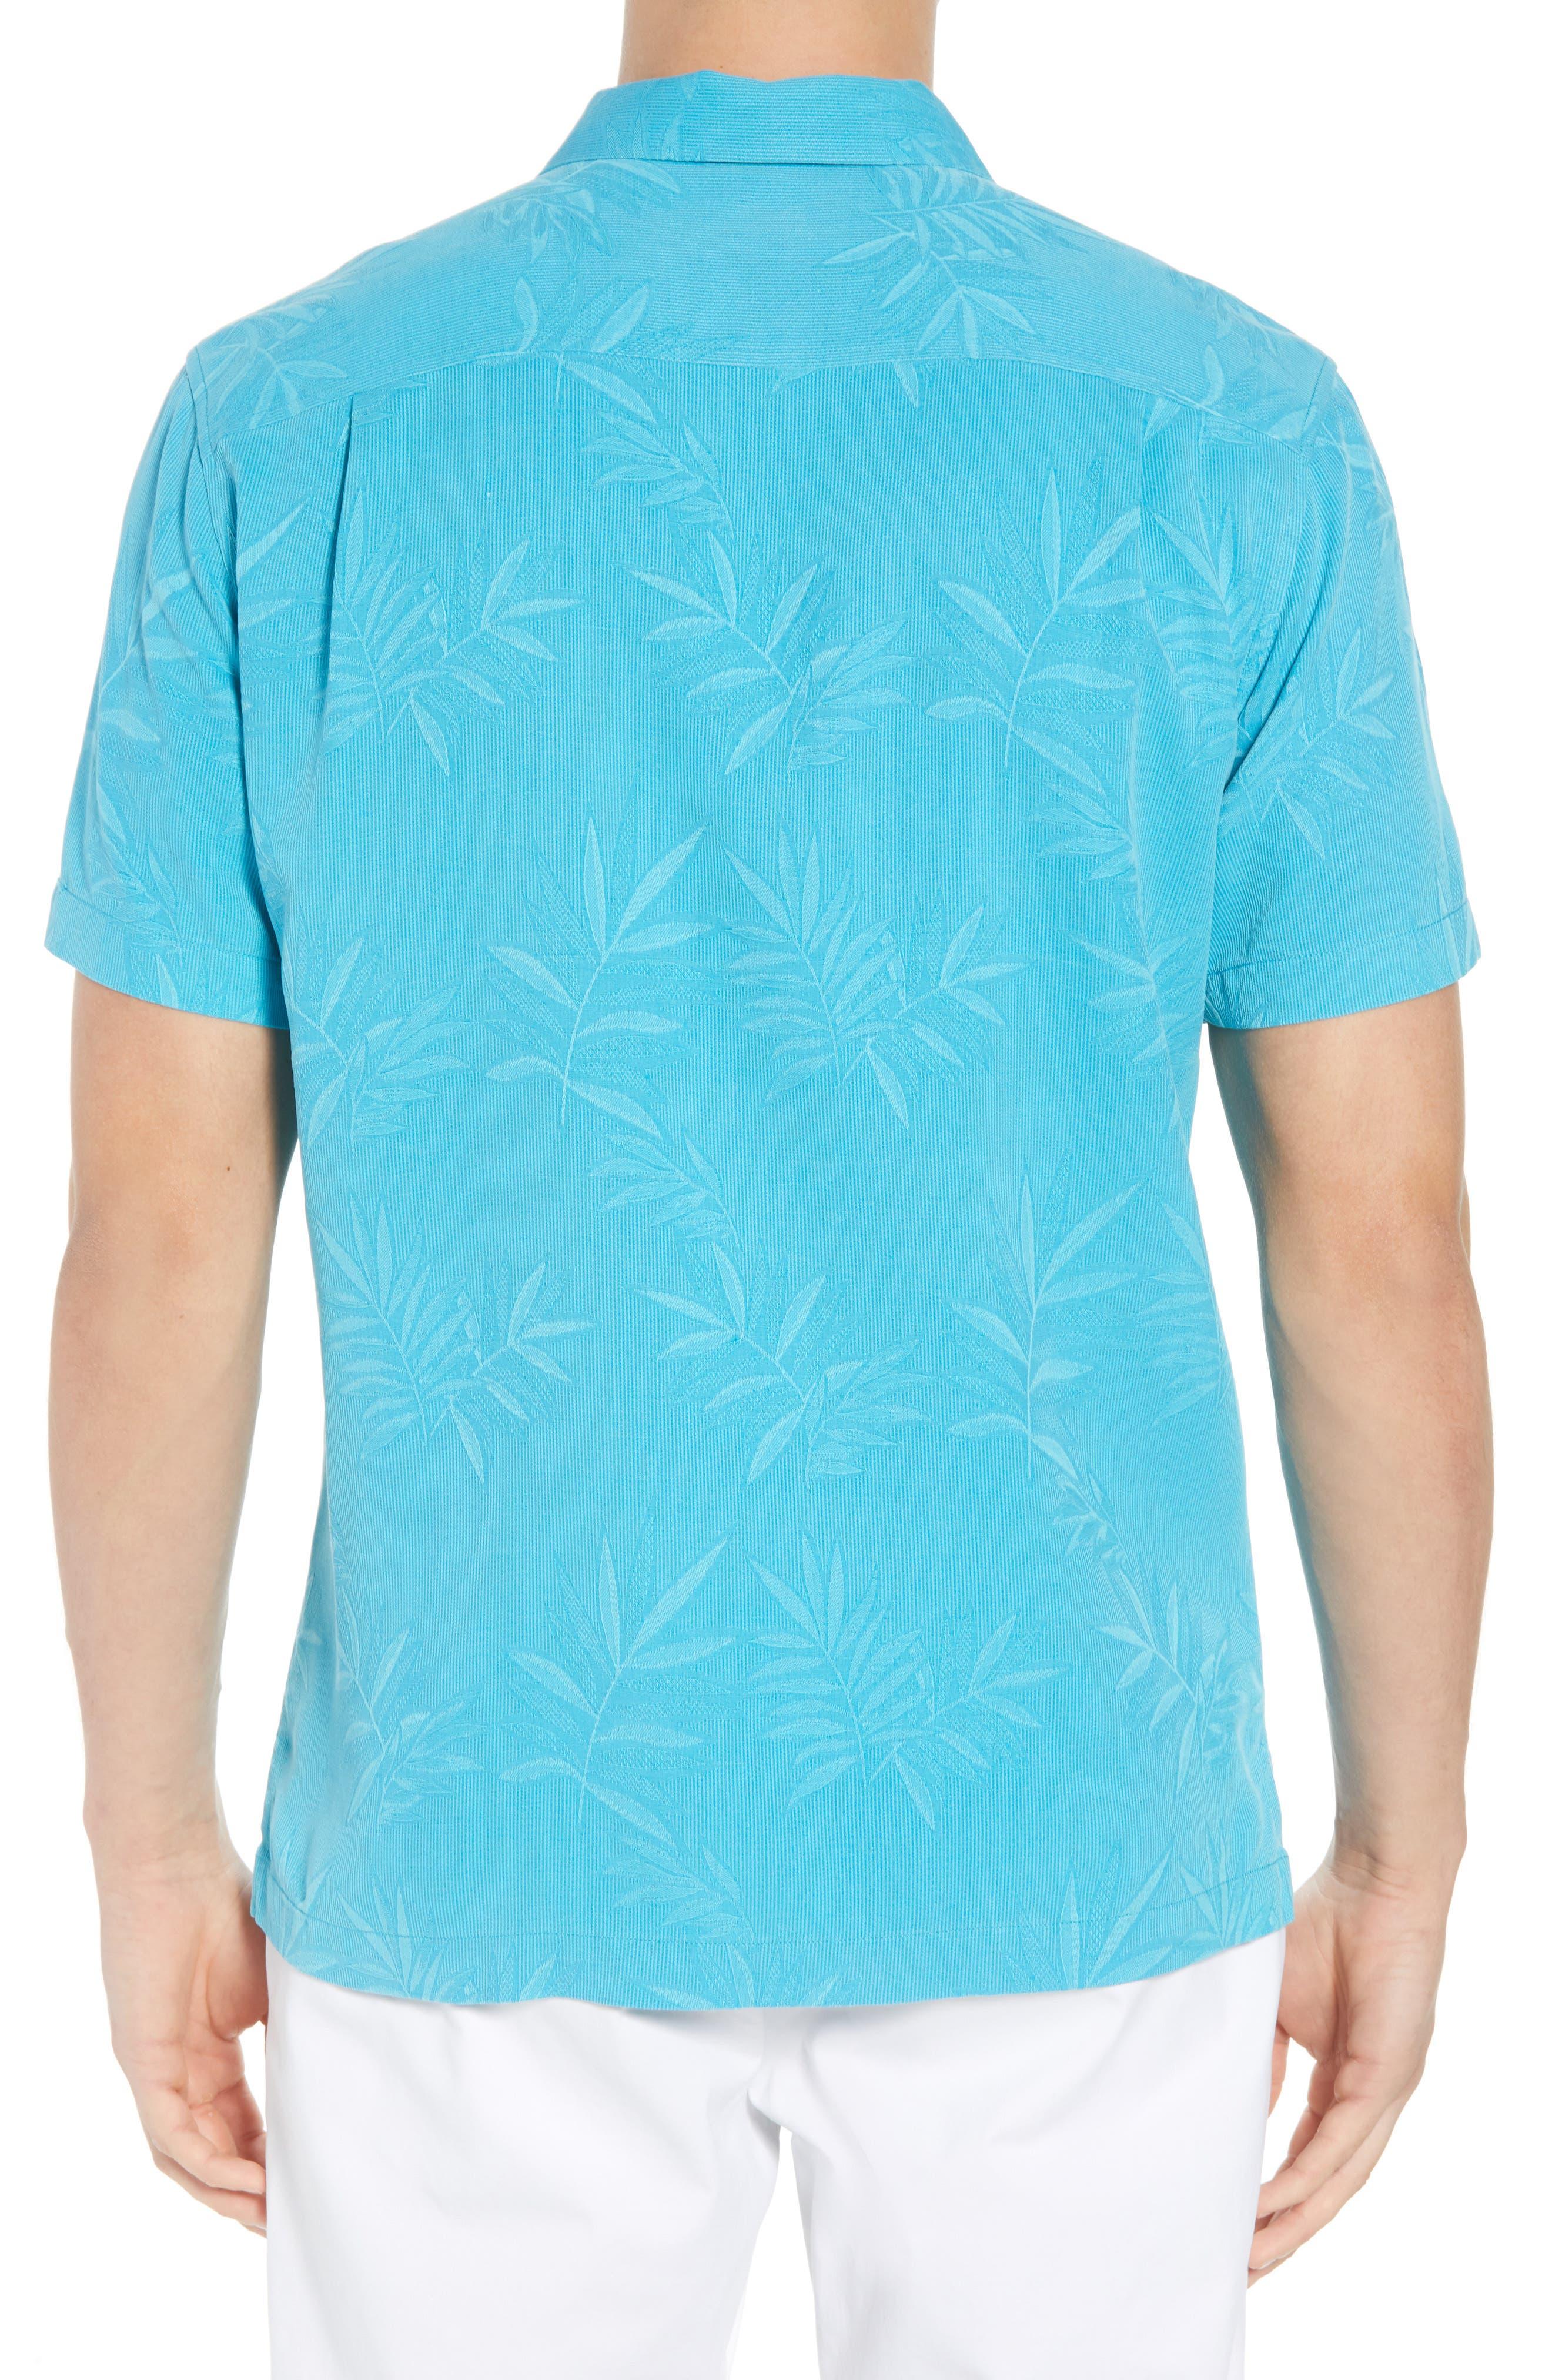 Luau Floral Silk Shirt,                             Alternate thumbnail 3, color,                             Pool Party Blue